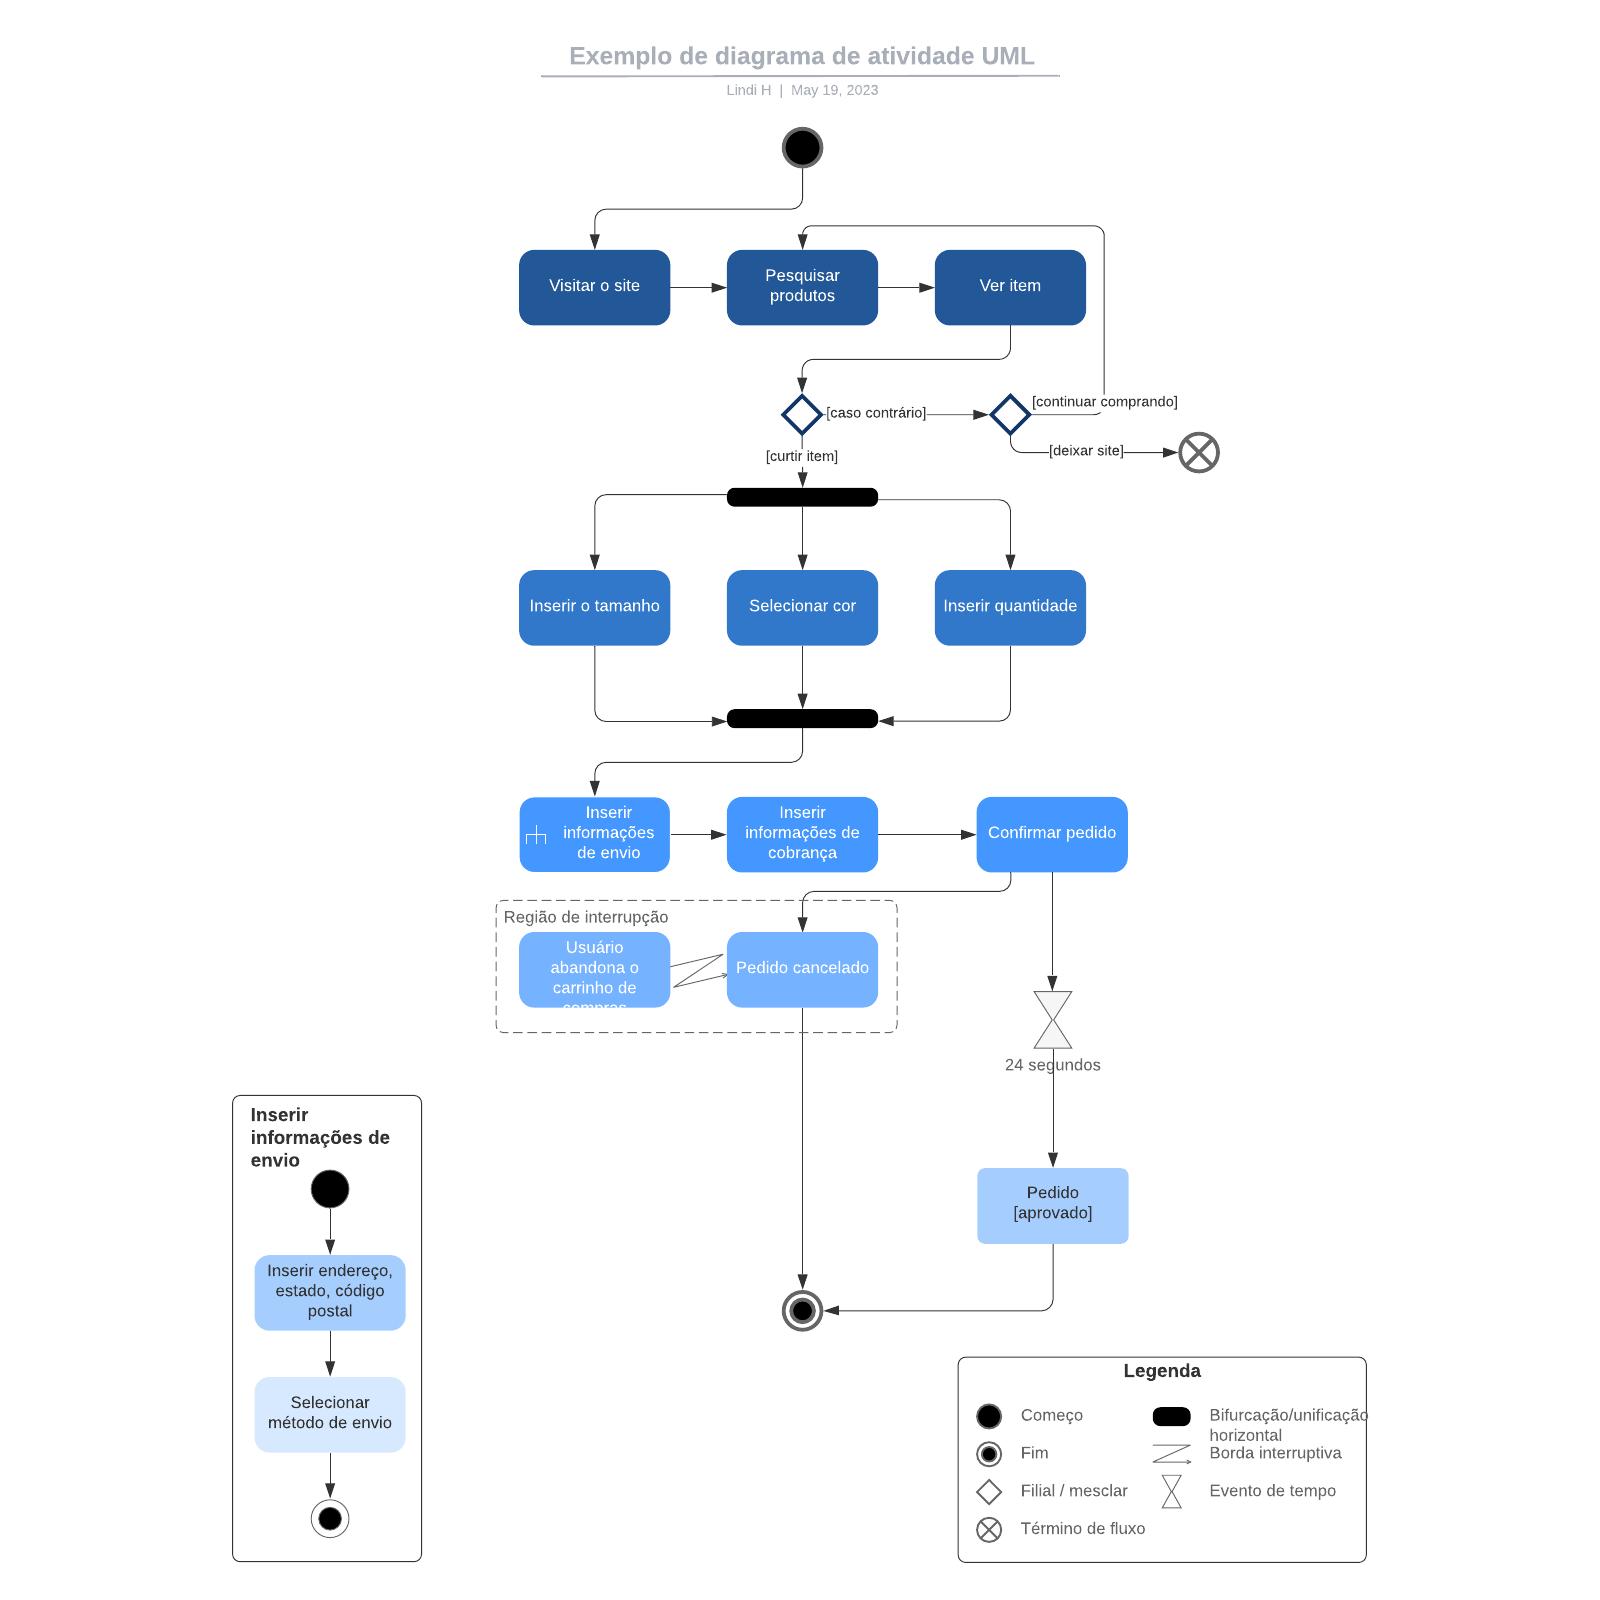 Exemplo de diagrama de atividade UML